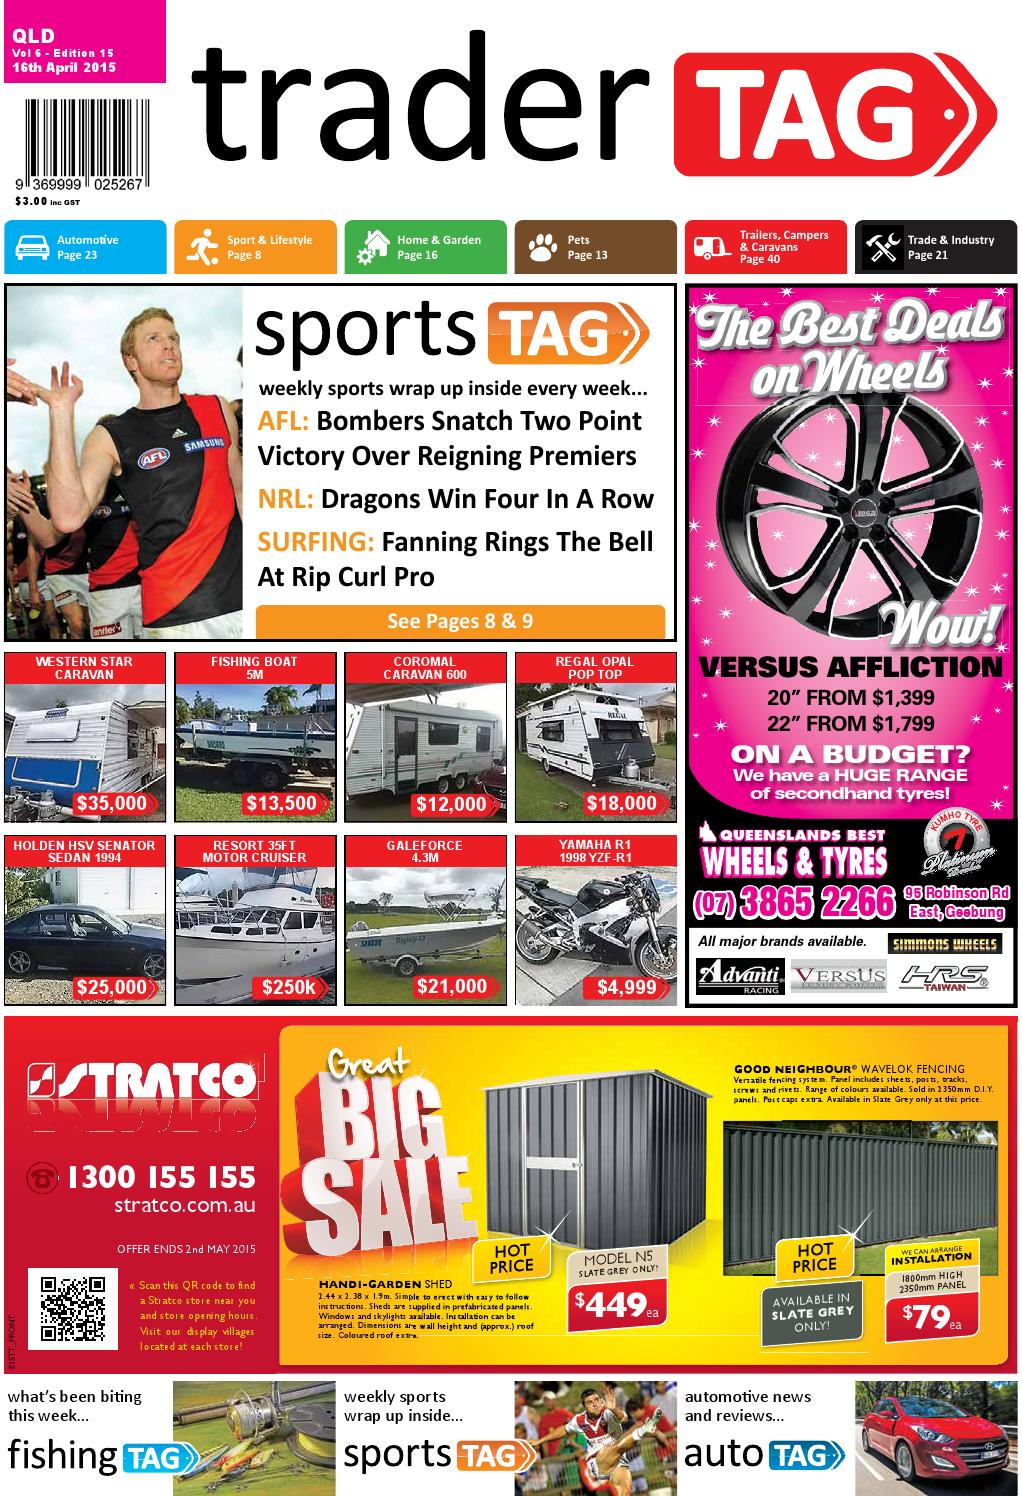 Tradertag Queensland Edition 15 2015 By Design Issuu Ferrari Backpack Piping Inch Xl Merah